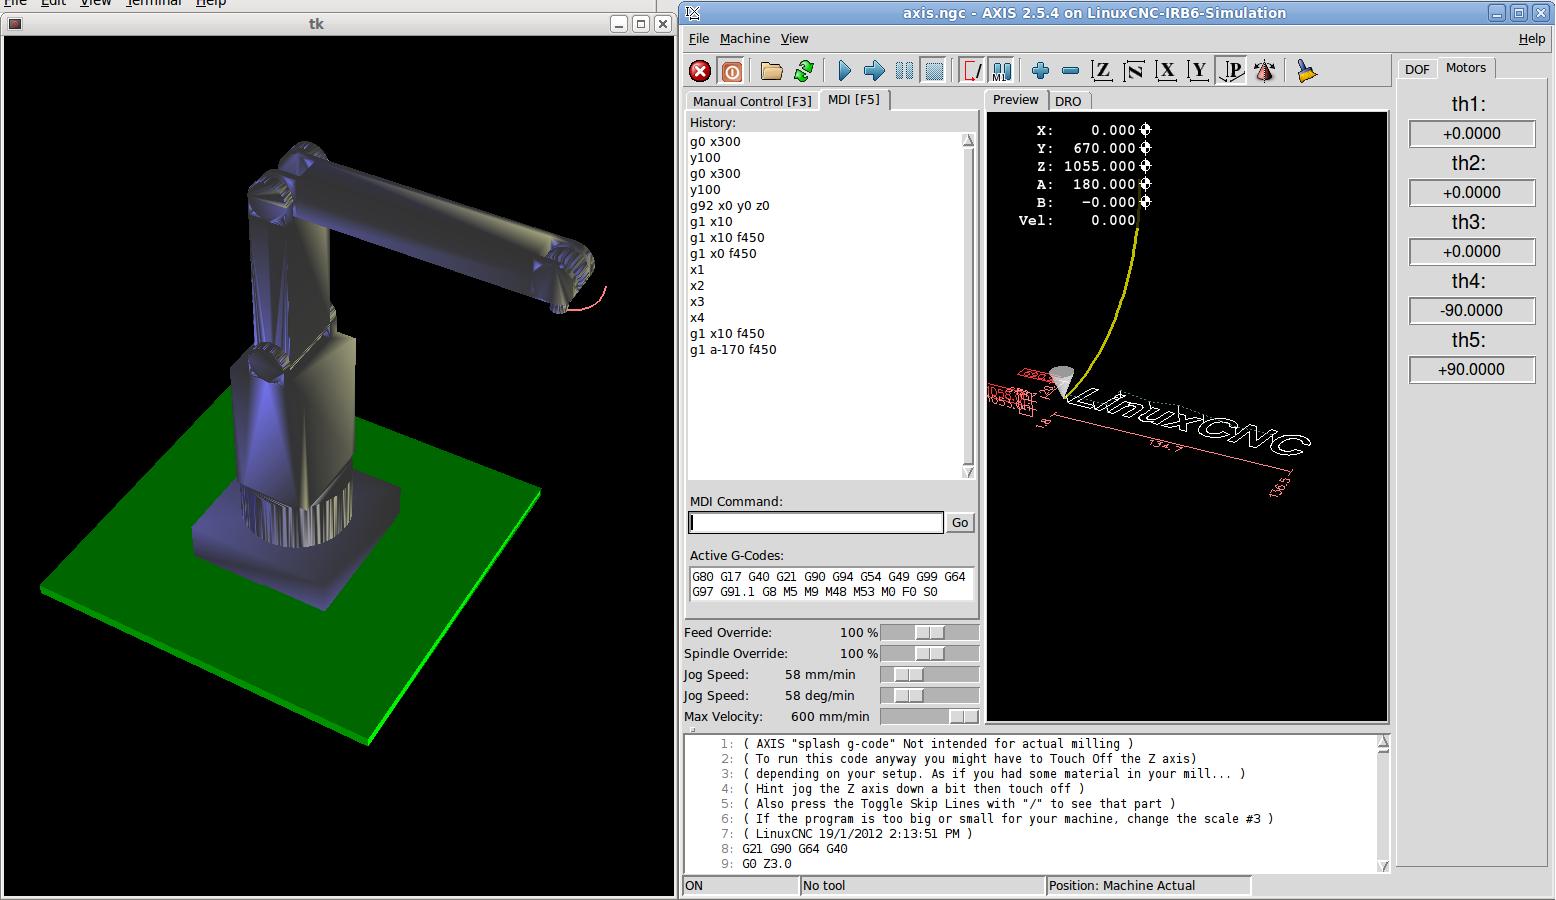 Manipulator Robot IRB6-S2 Simulation - pre - LinuxCNC